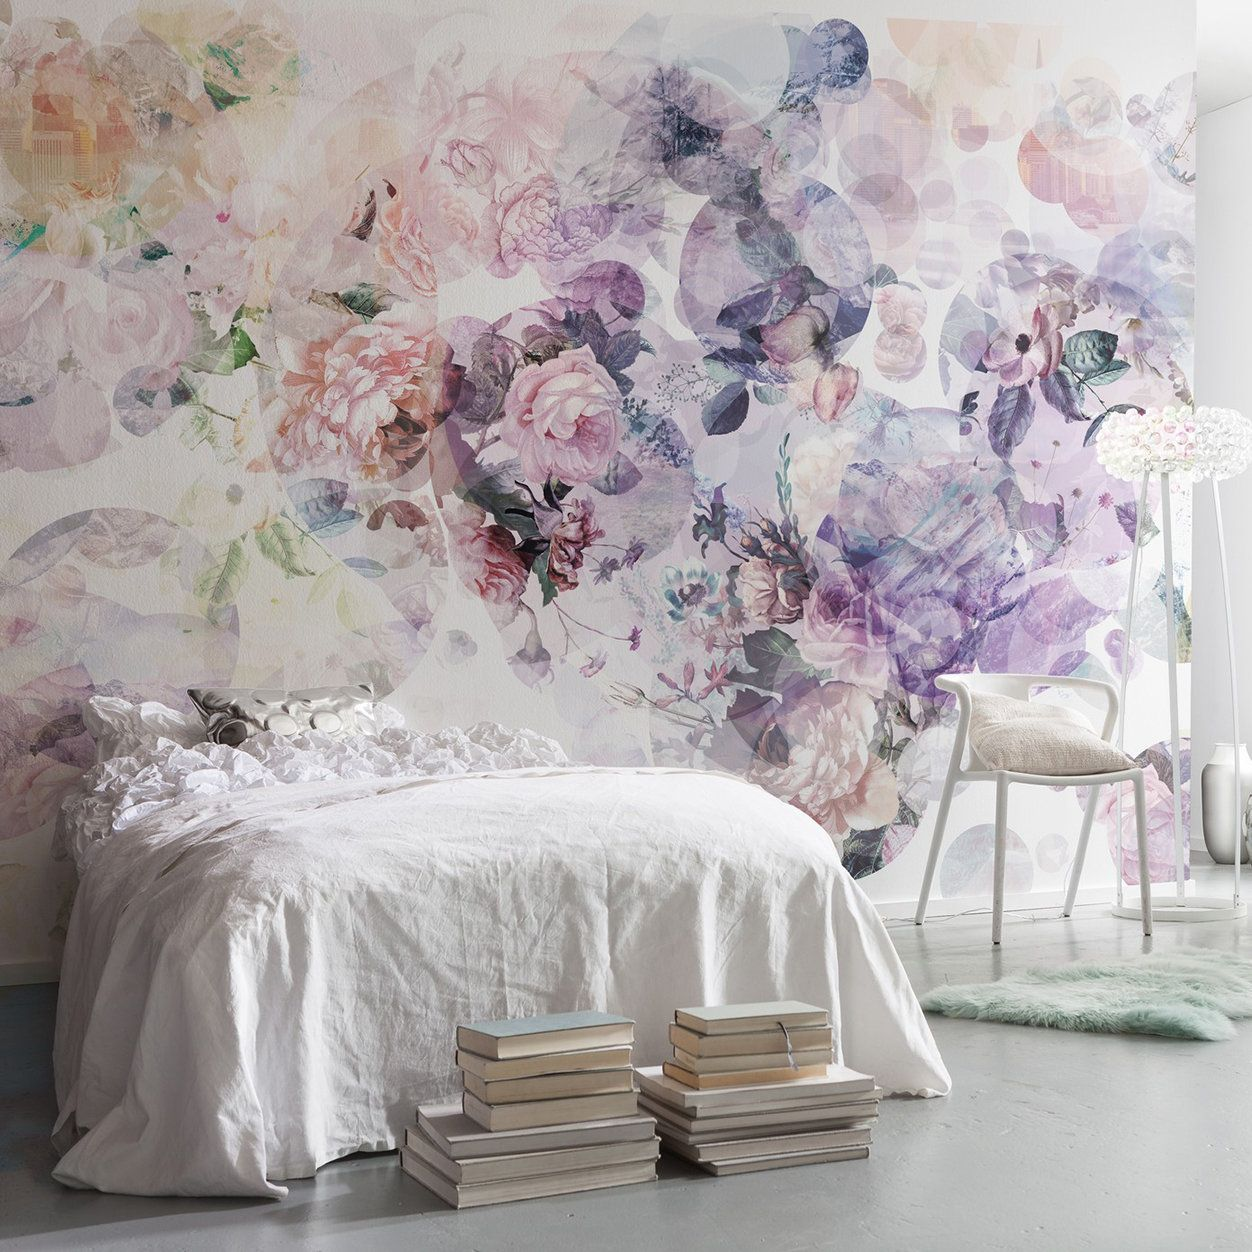 Brewster Home Fashions Wish Wall Mural Wayfair Wall